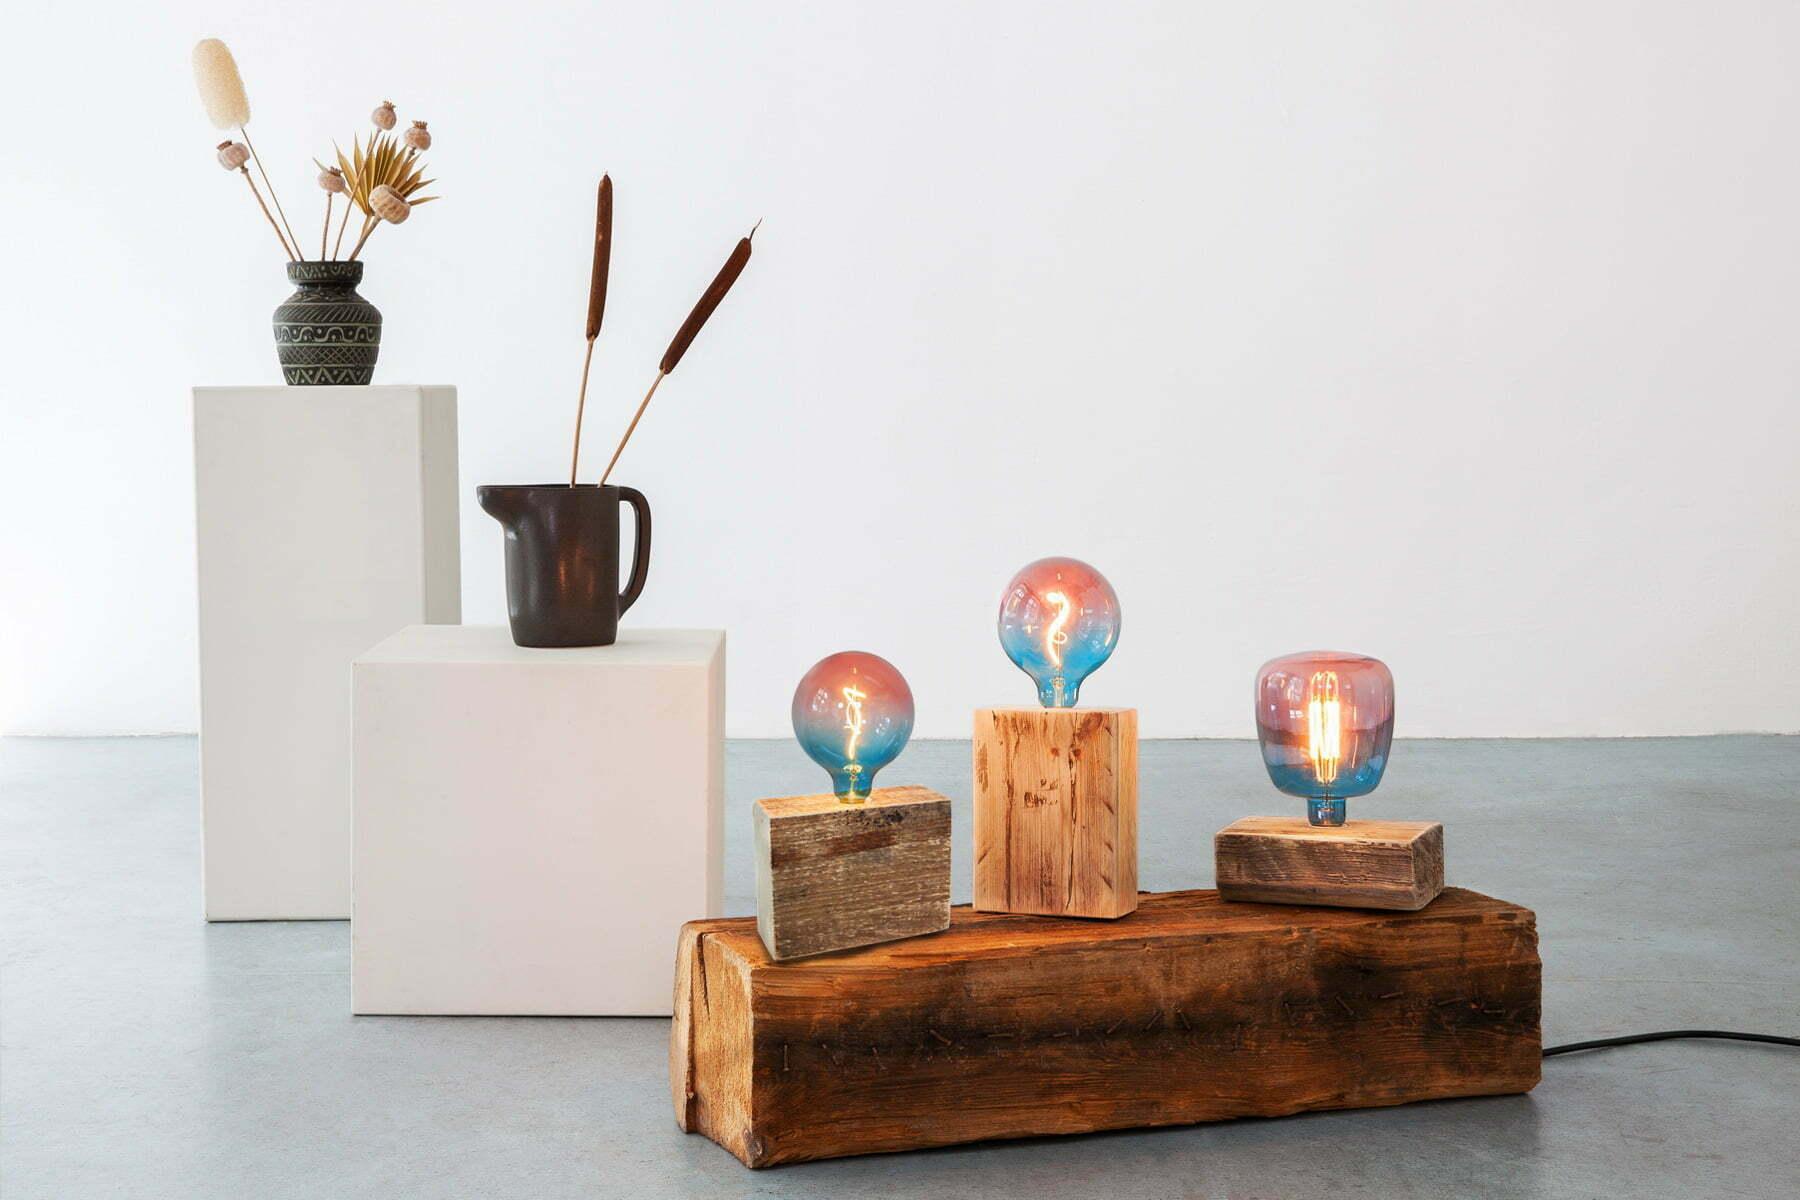 UpCycle-Berlin-Lampe-FIREWOOD-KLOTZ-Leuchtobjekt-Galerie